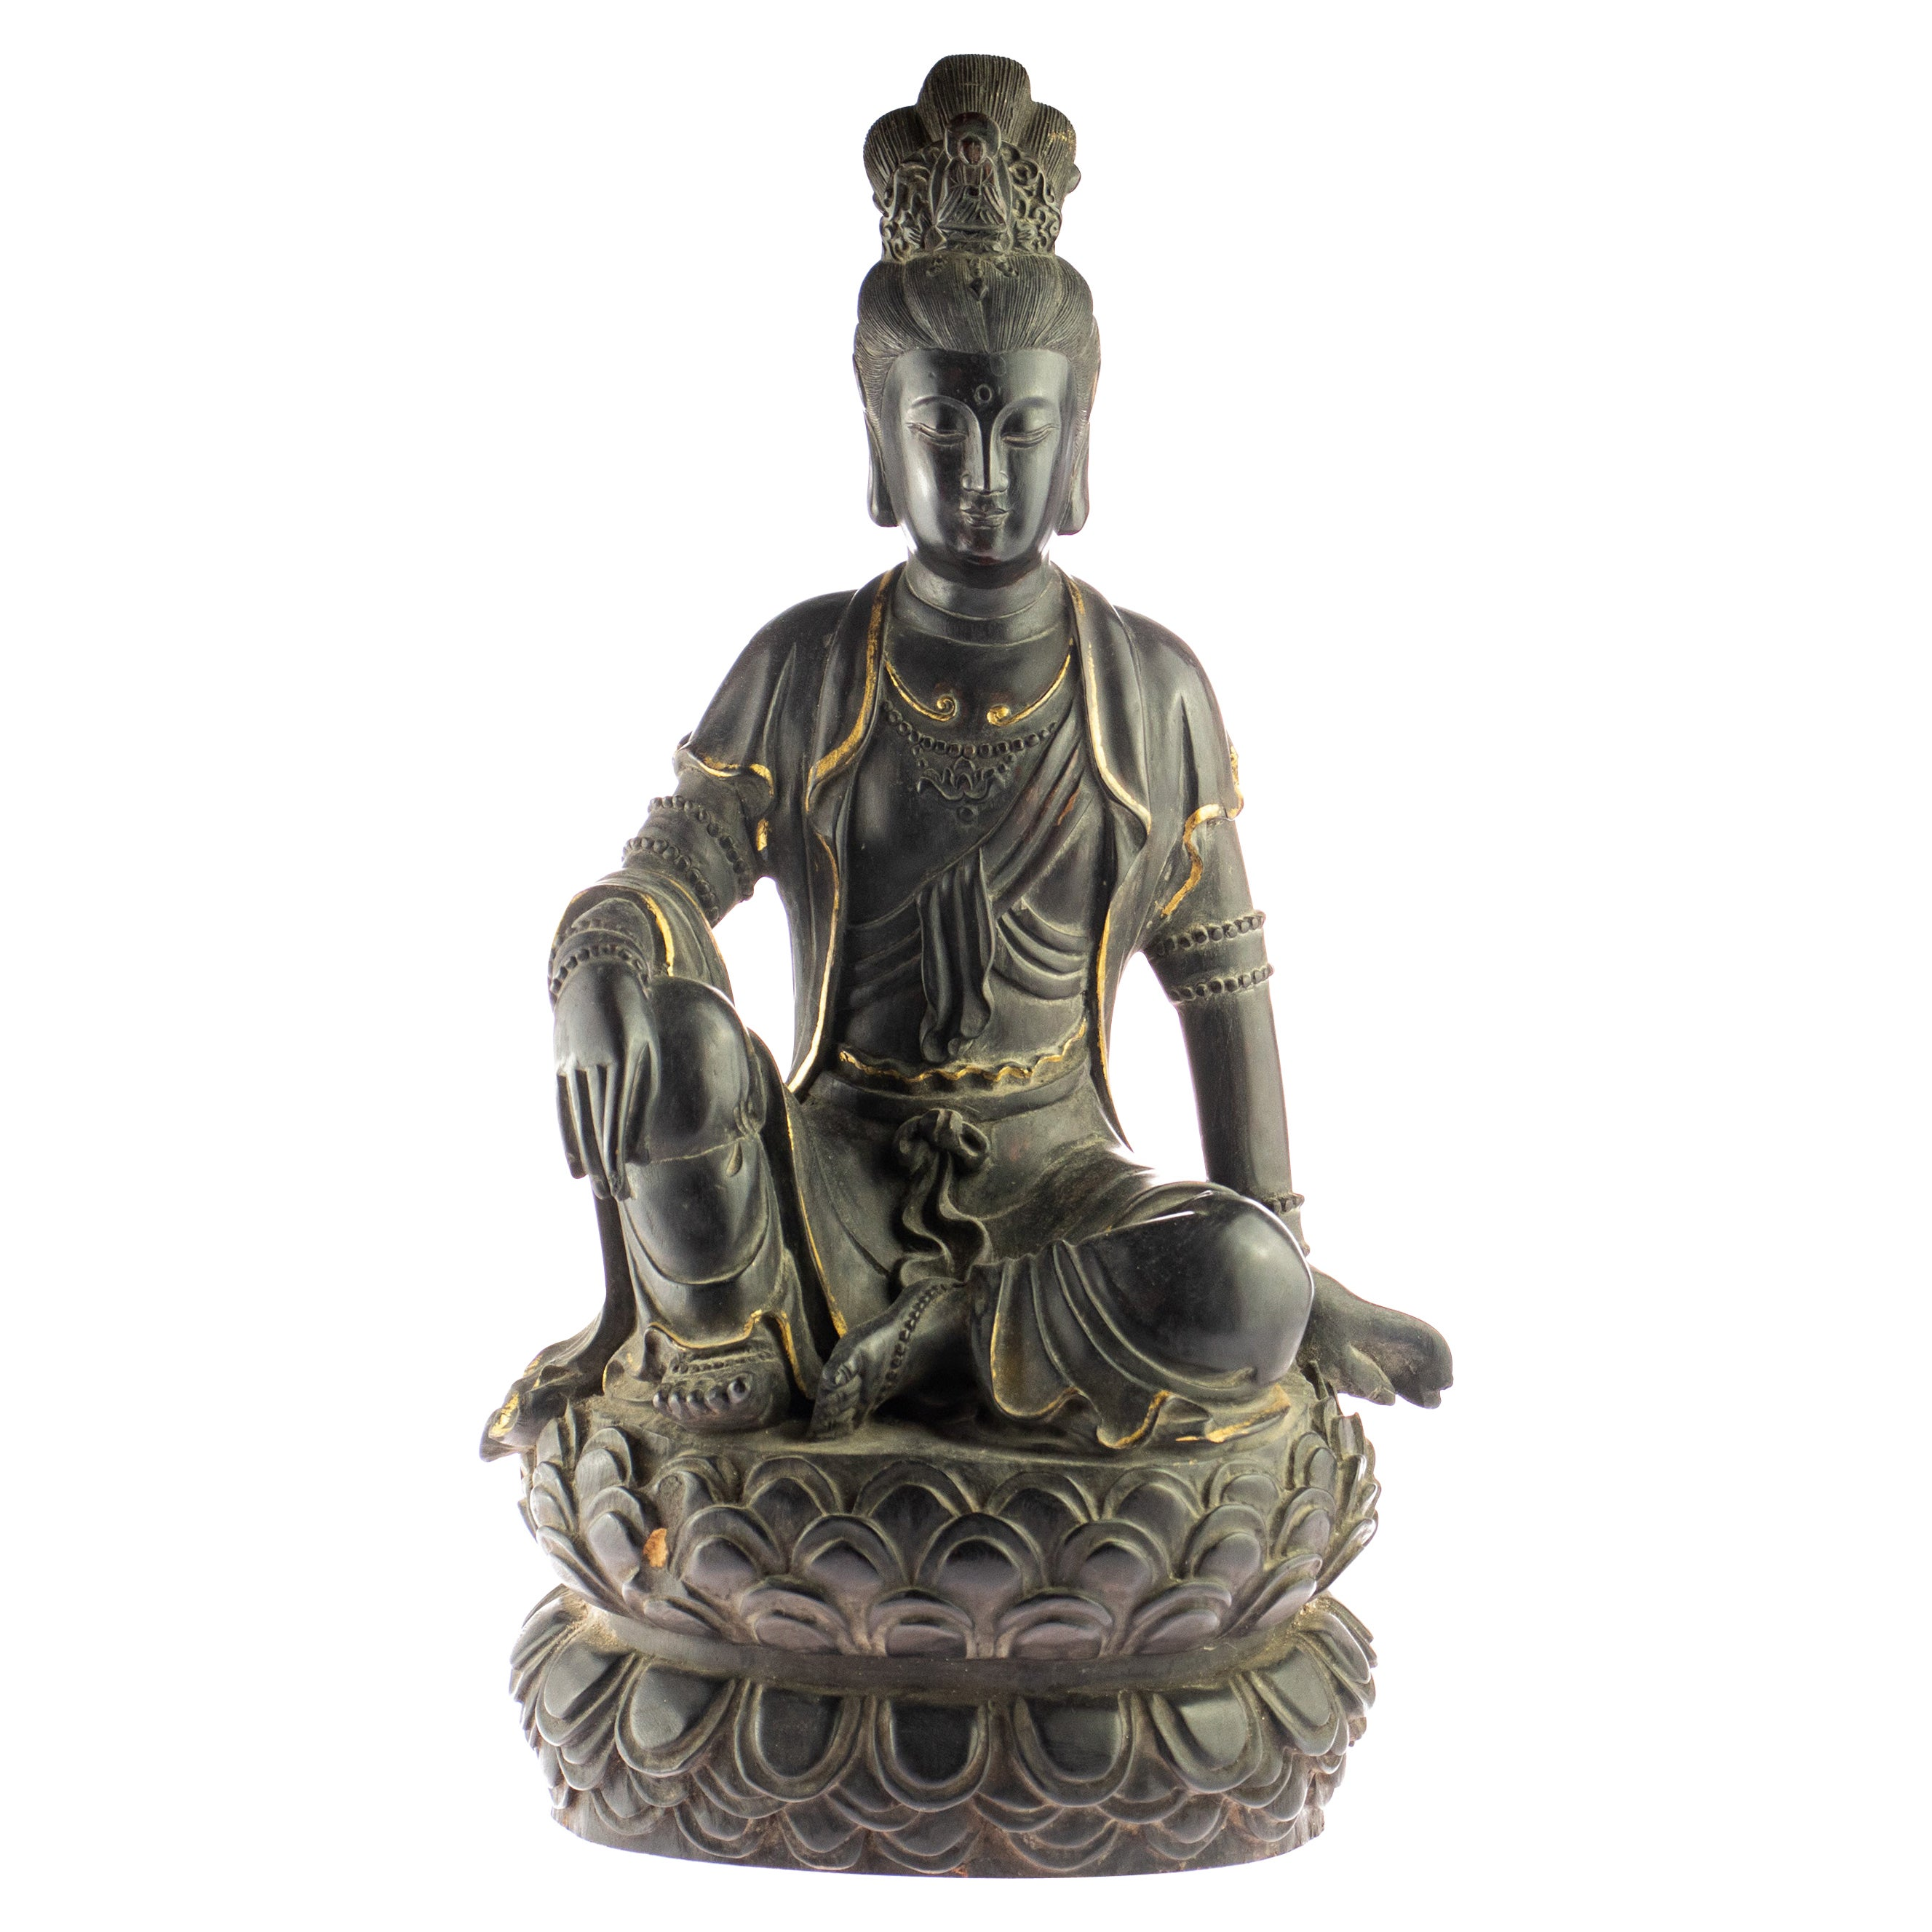 Wood Guanyin Bodhisattva Female Buddha Asian Handmade Carved Statue Sculpture